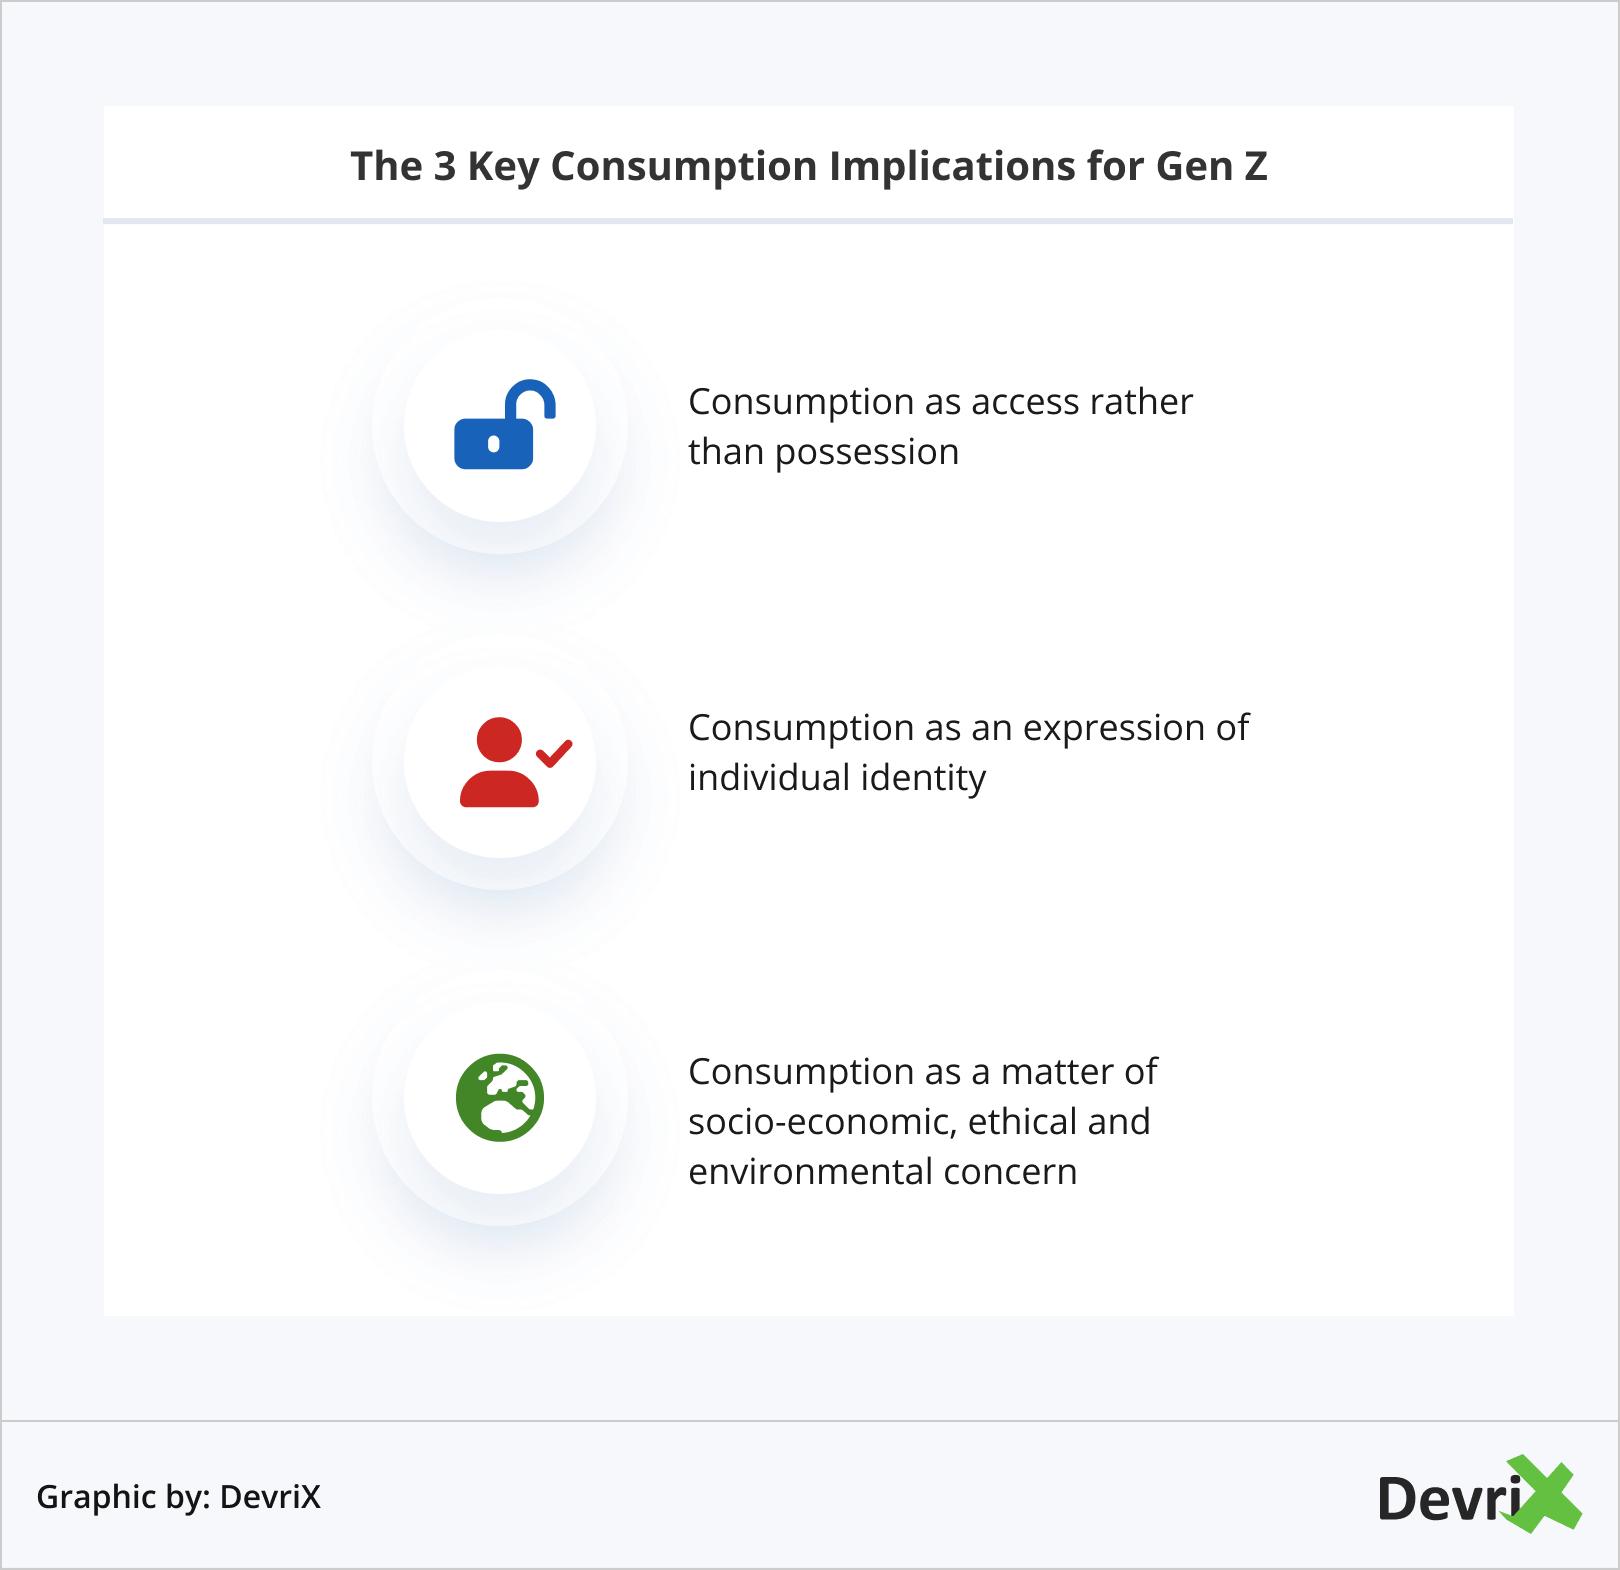 The 3 Key Consumption Implications for Gen Z